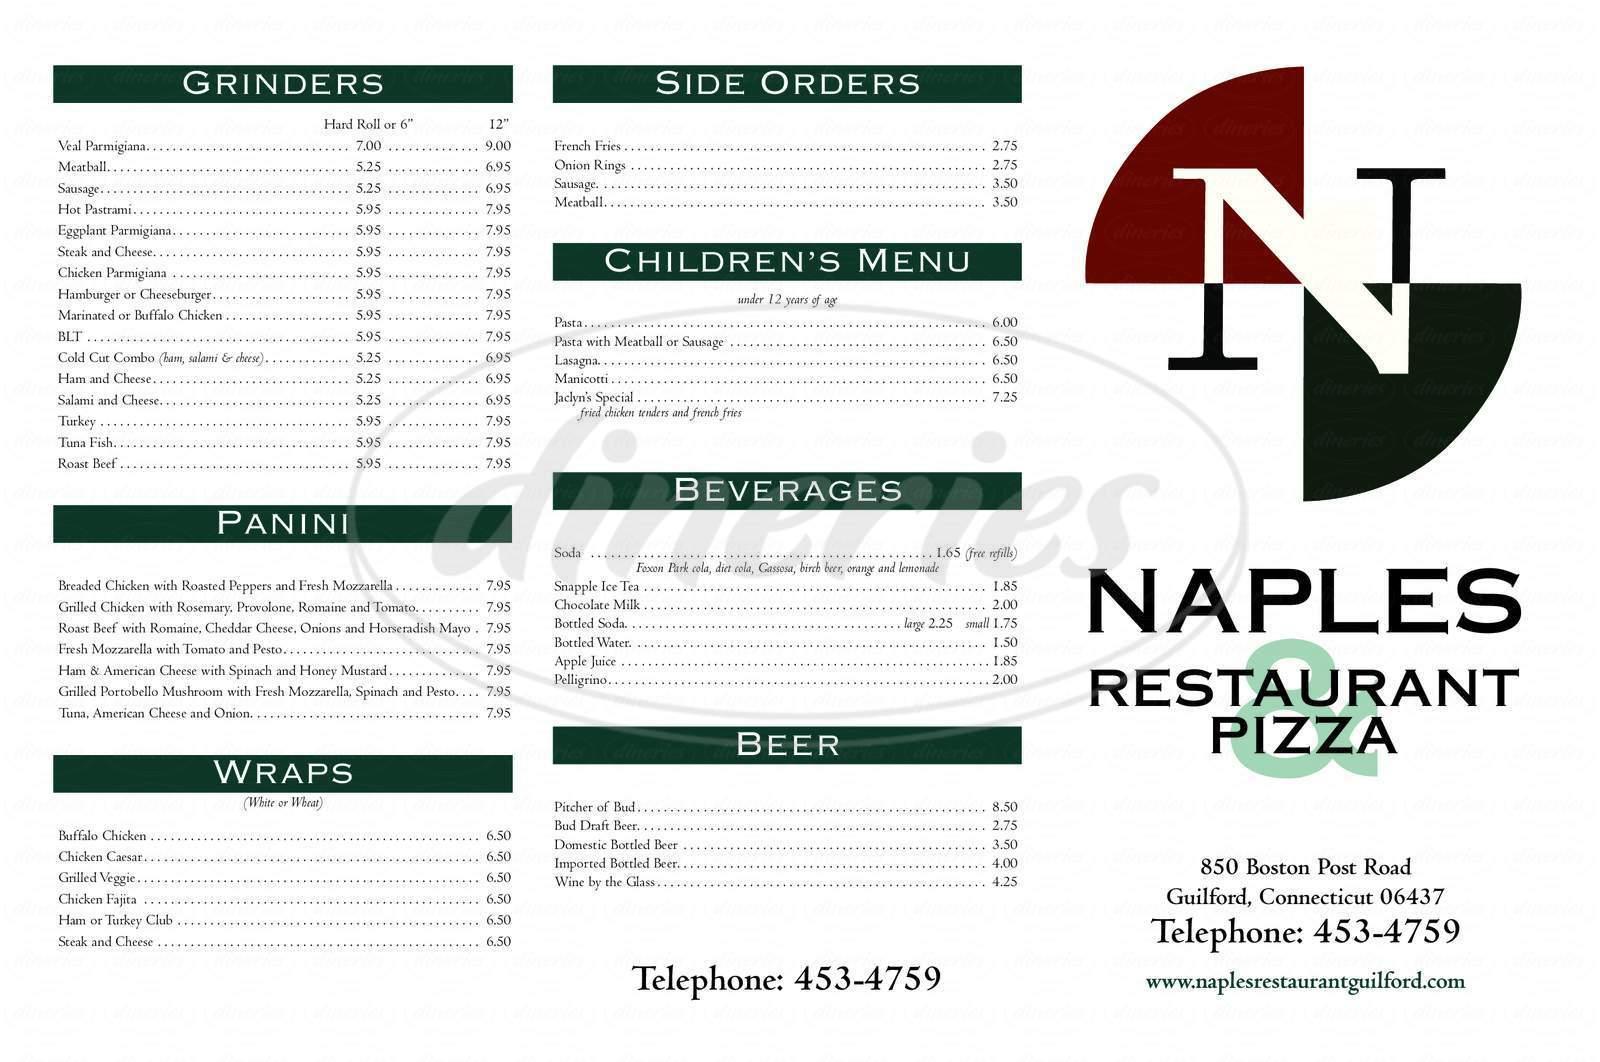 menu for Naples Restaurant & Pizza Inc